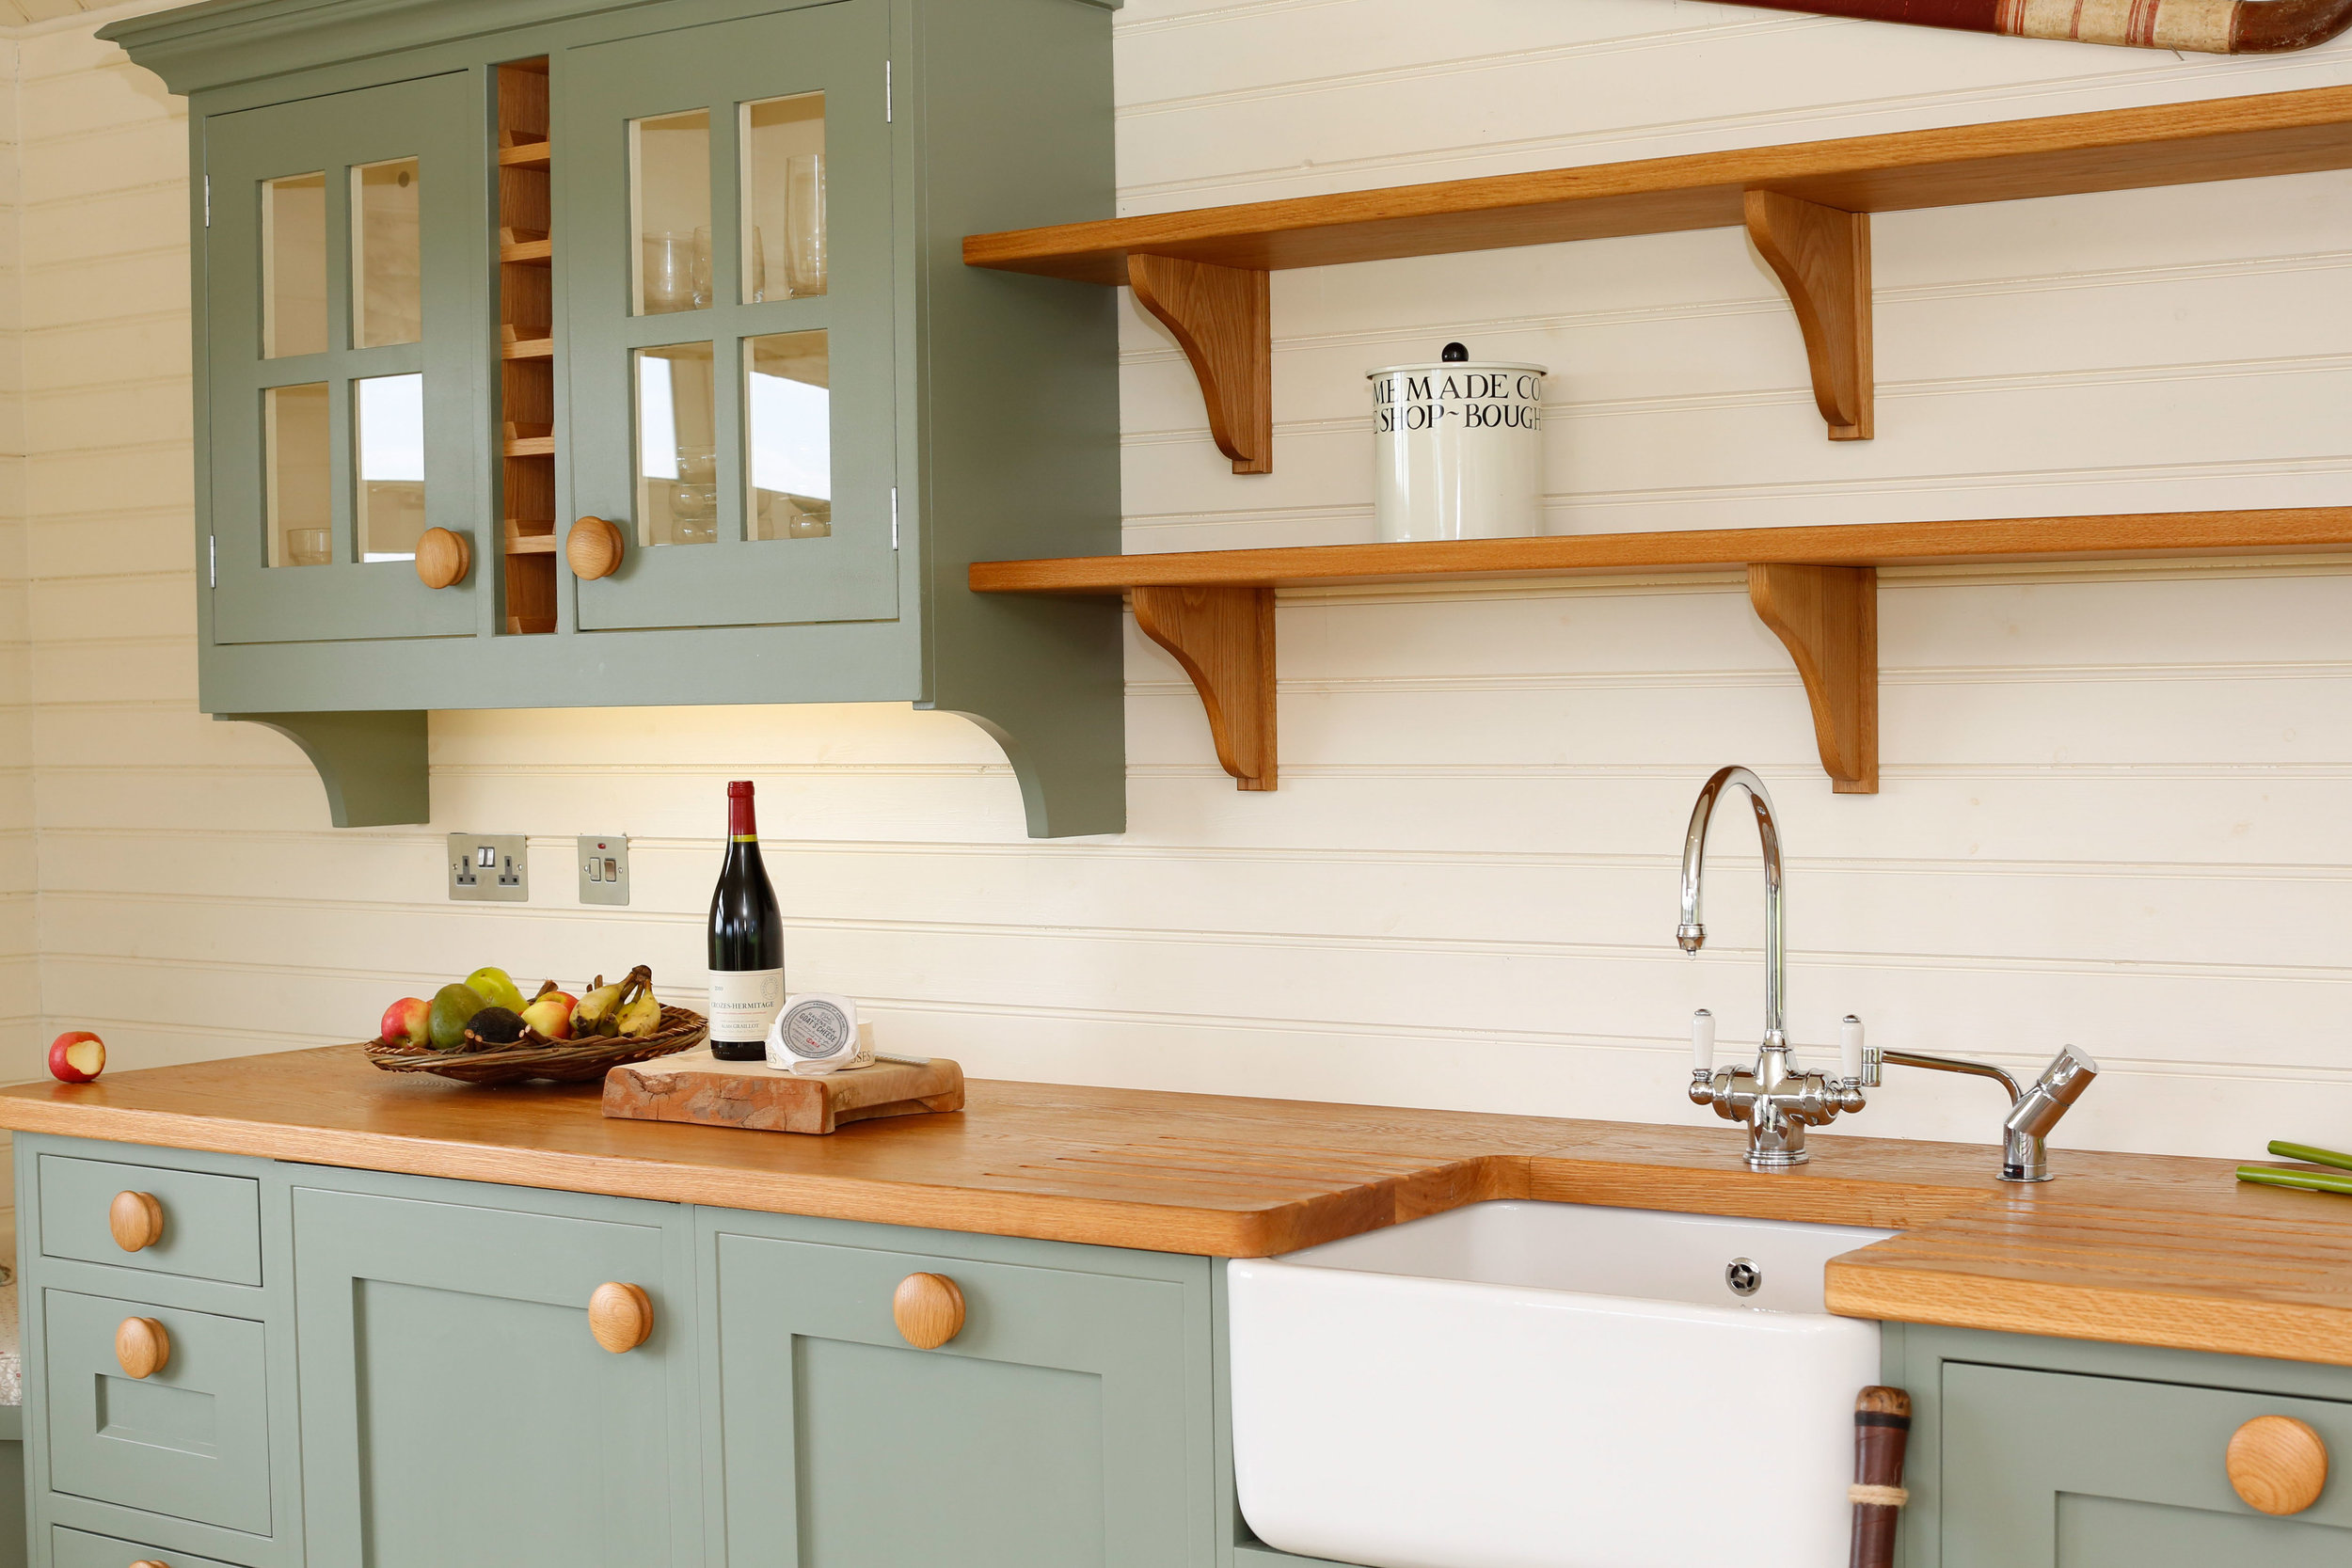 countryside kitchen detail 2